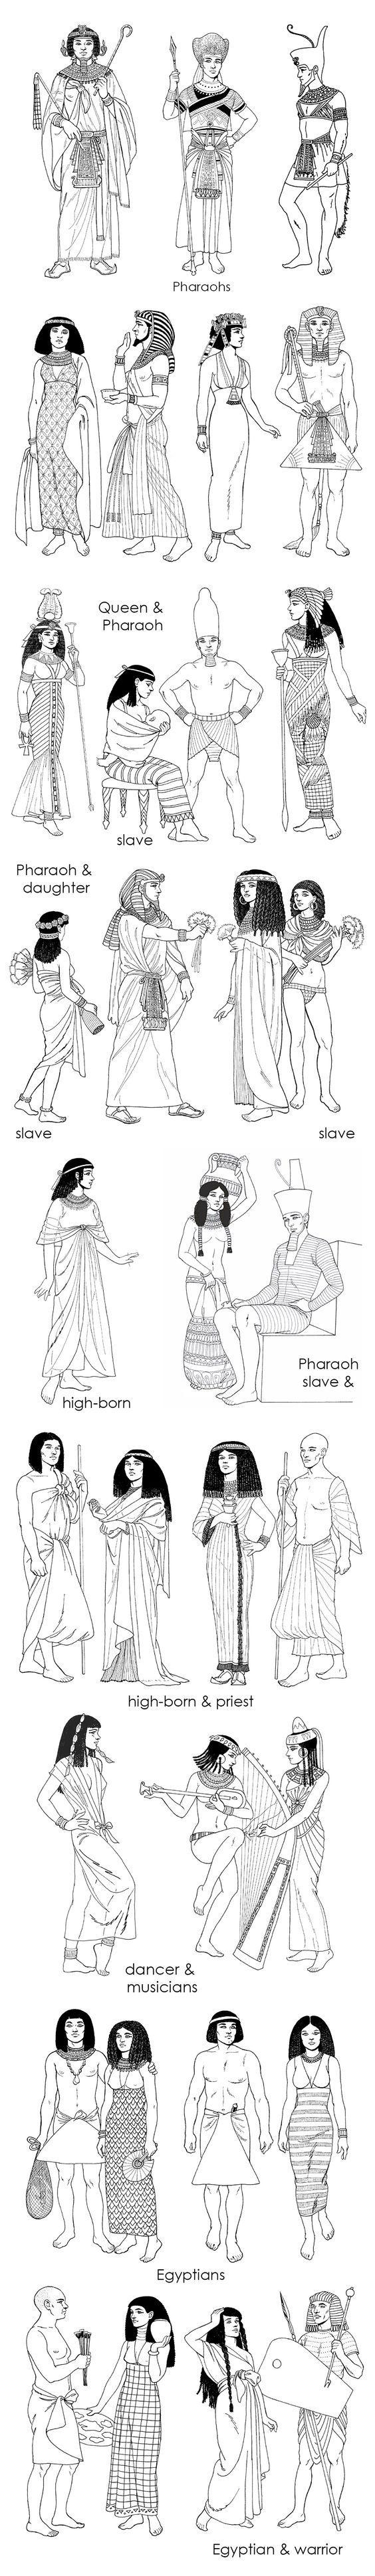 Pharaoh, queen, slave, egyptians, Egypt: